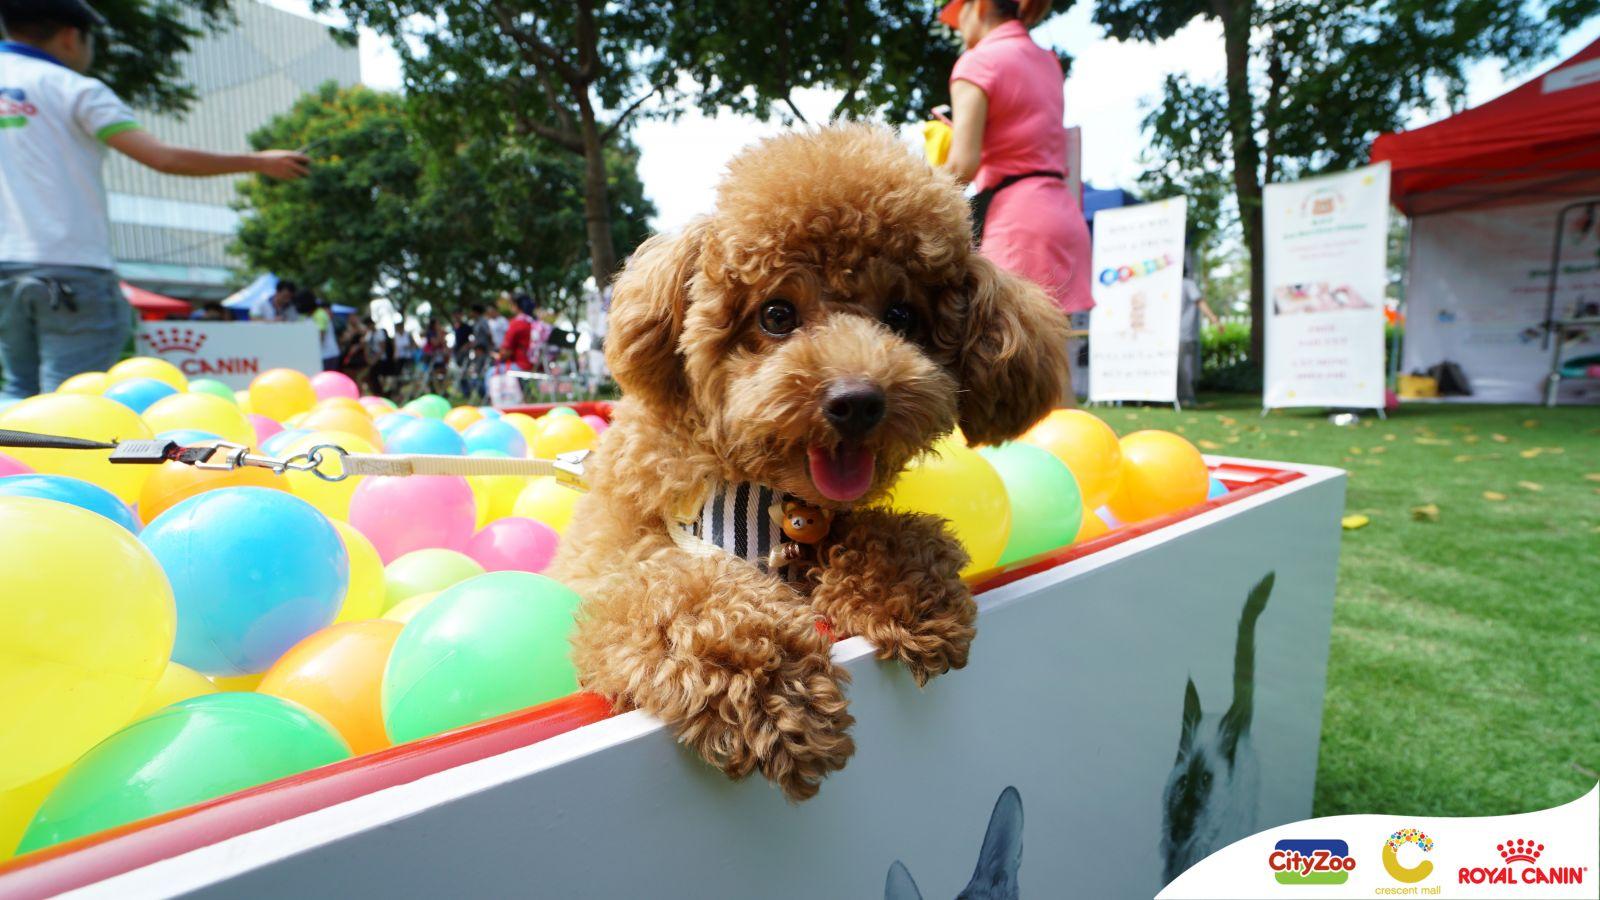 cho-toy-poodle-trong-nha-banh